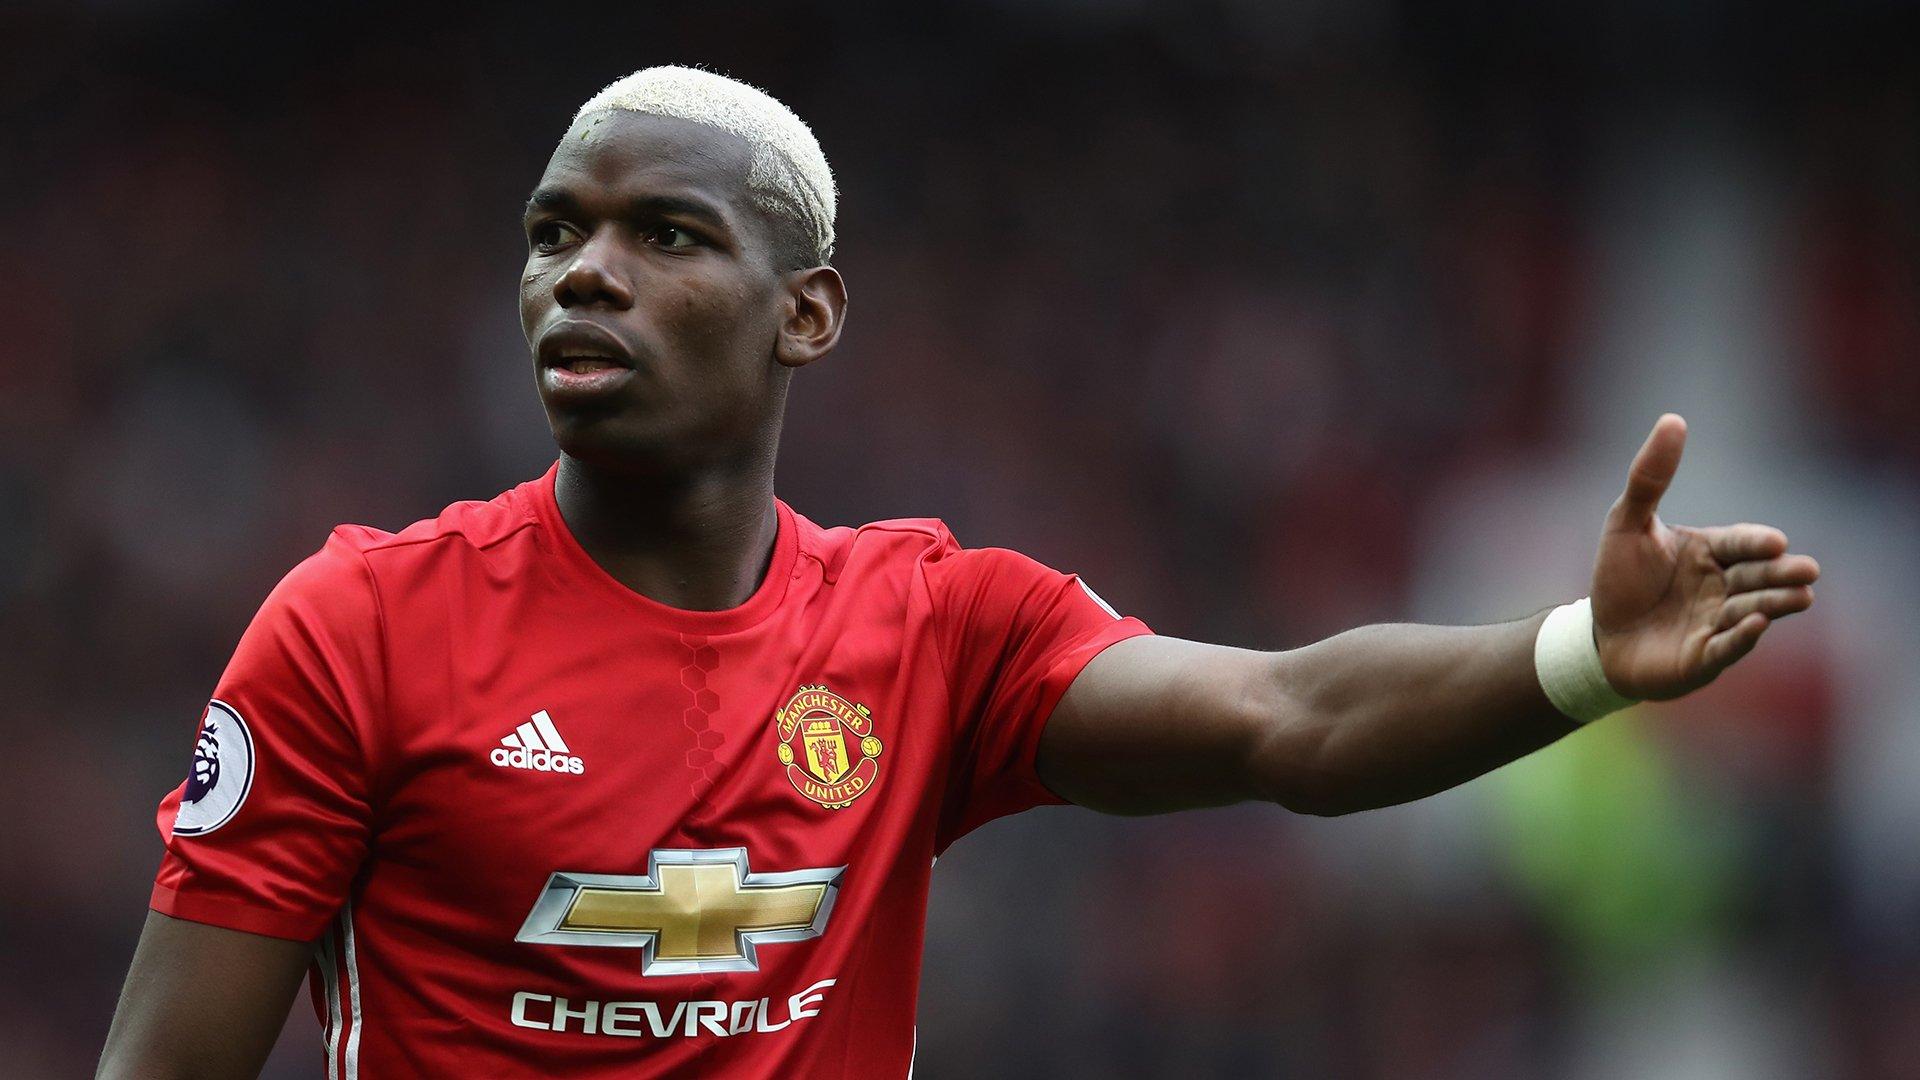 «Манчестер Юнайтед» победил «Челси» вматче чемпионата Британии пофутболу